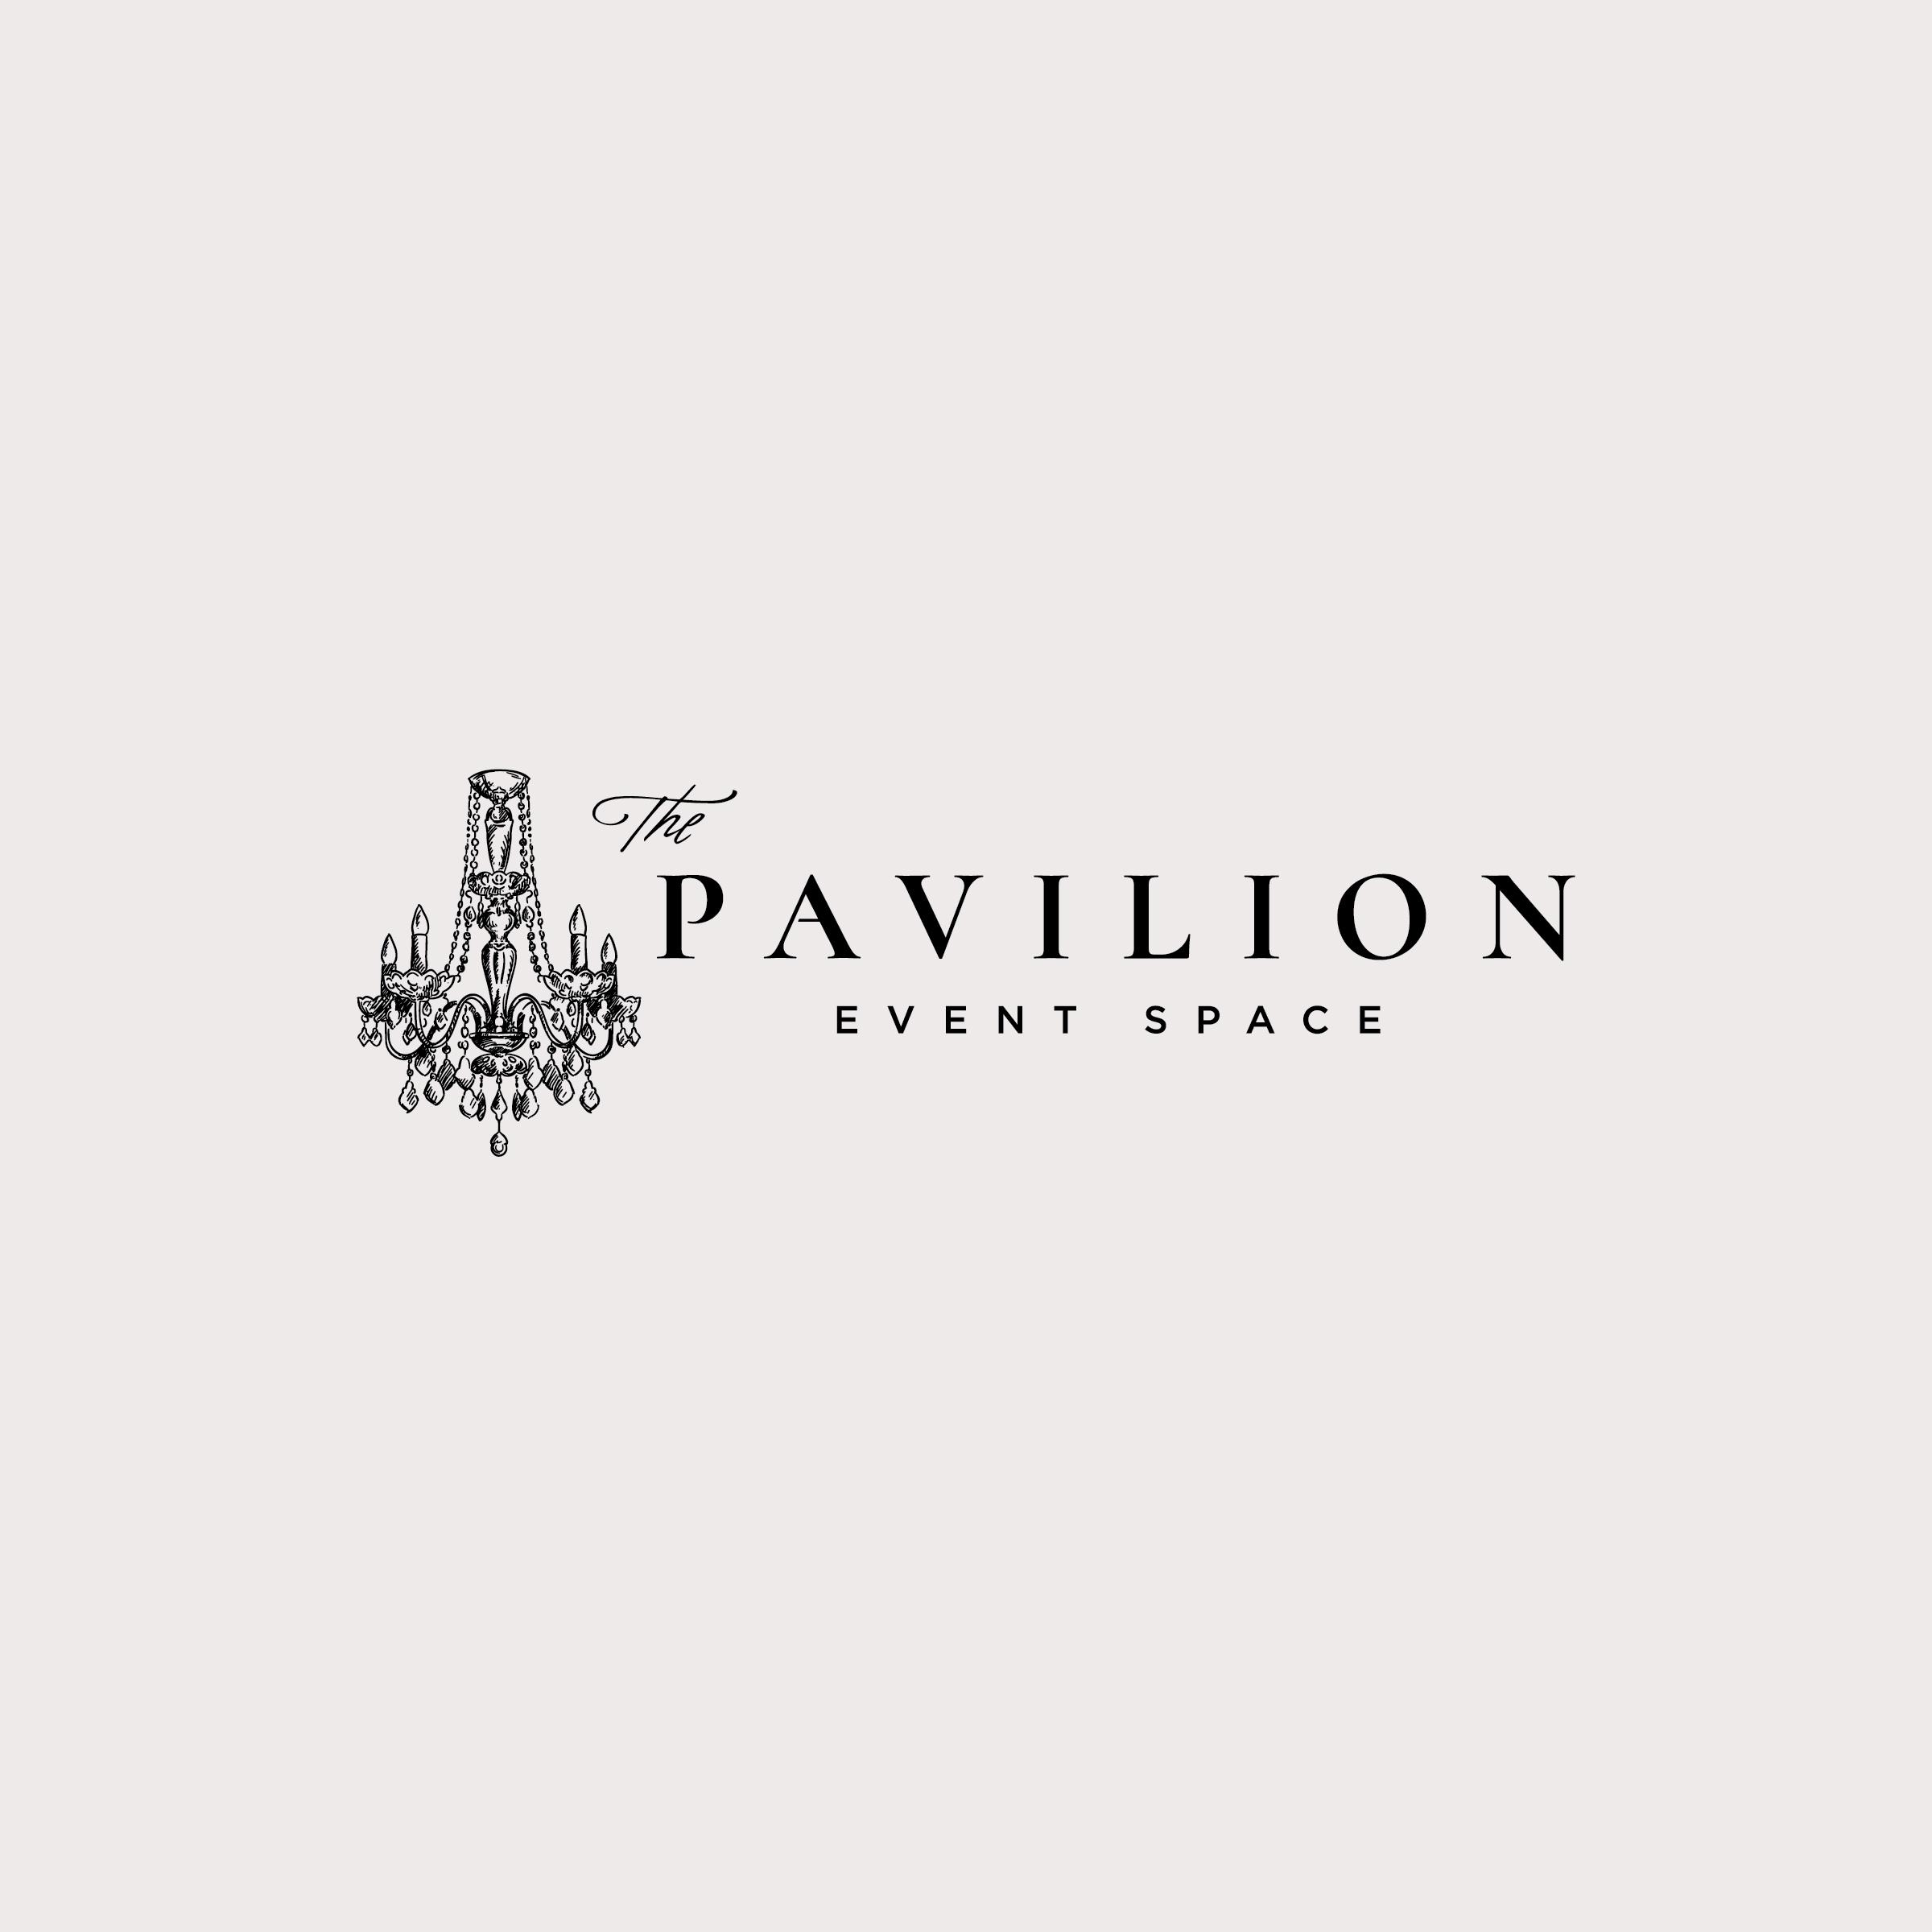 Calico Hill Creative Pavilion Event Space Logo Design